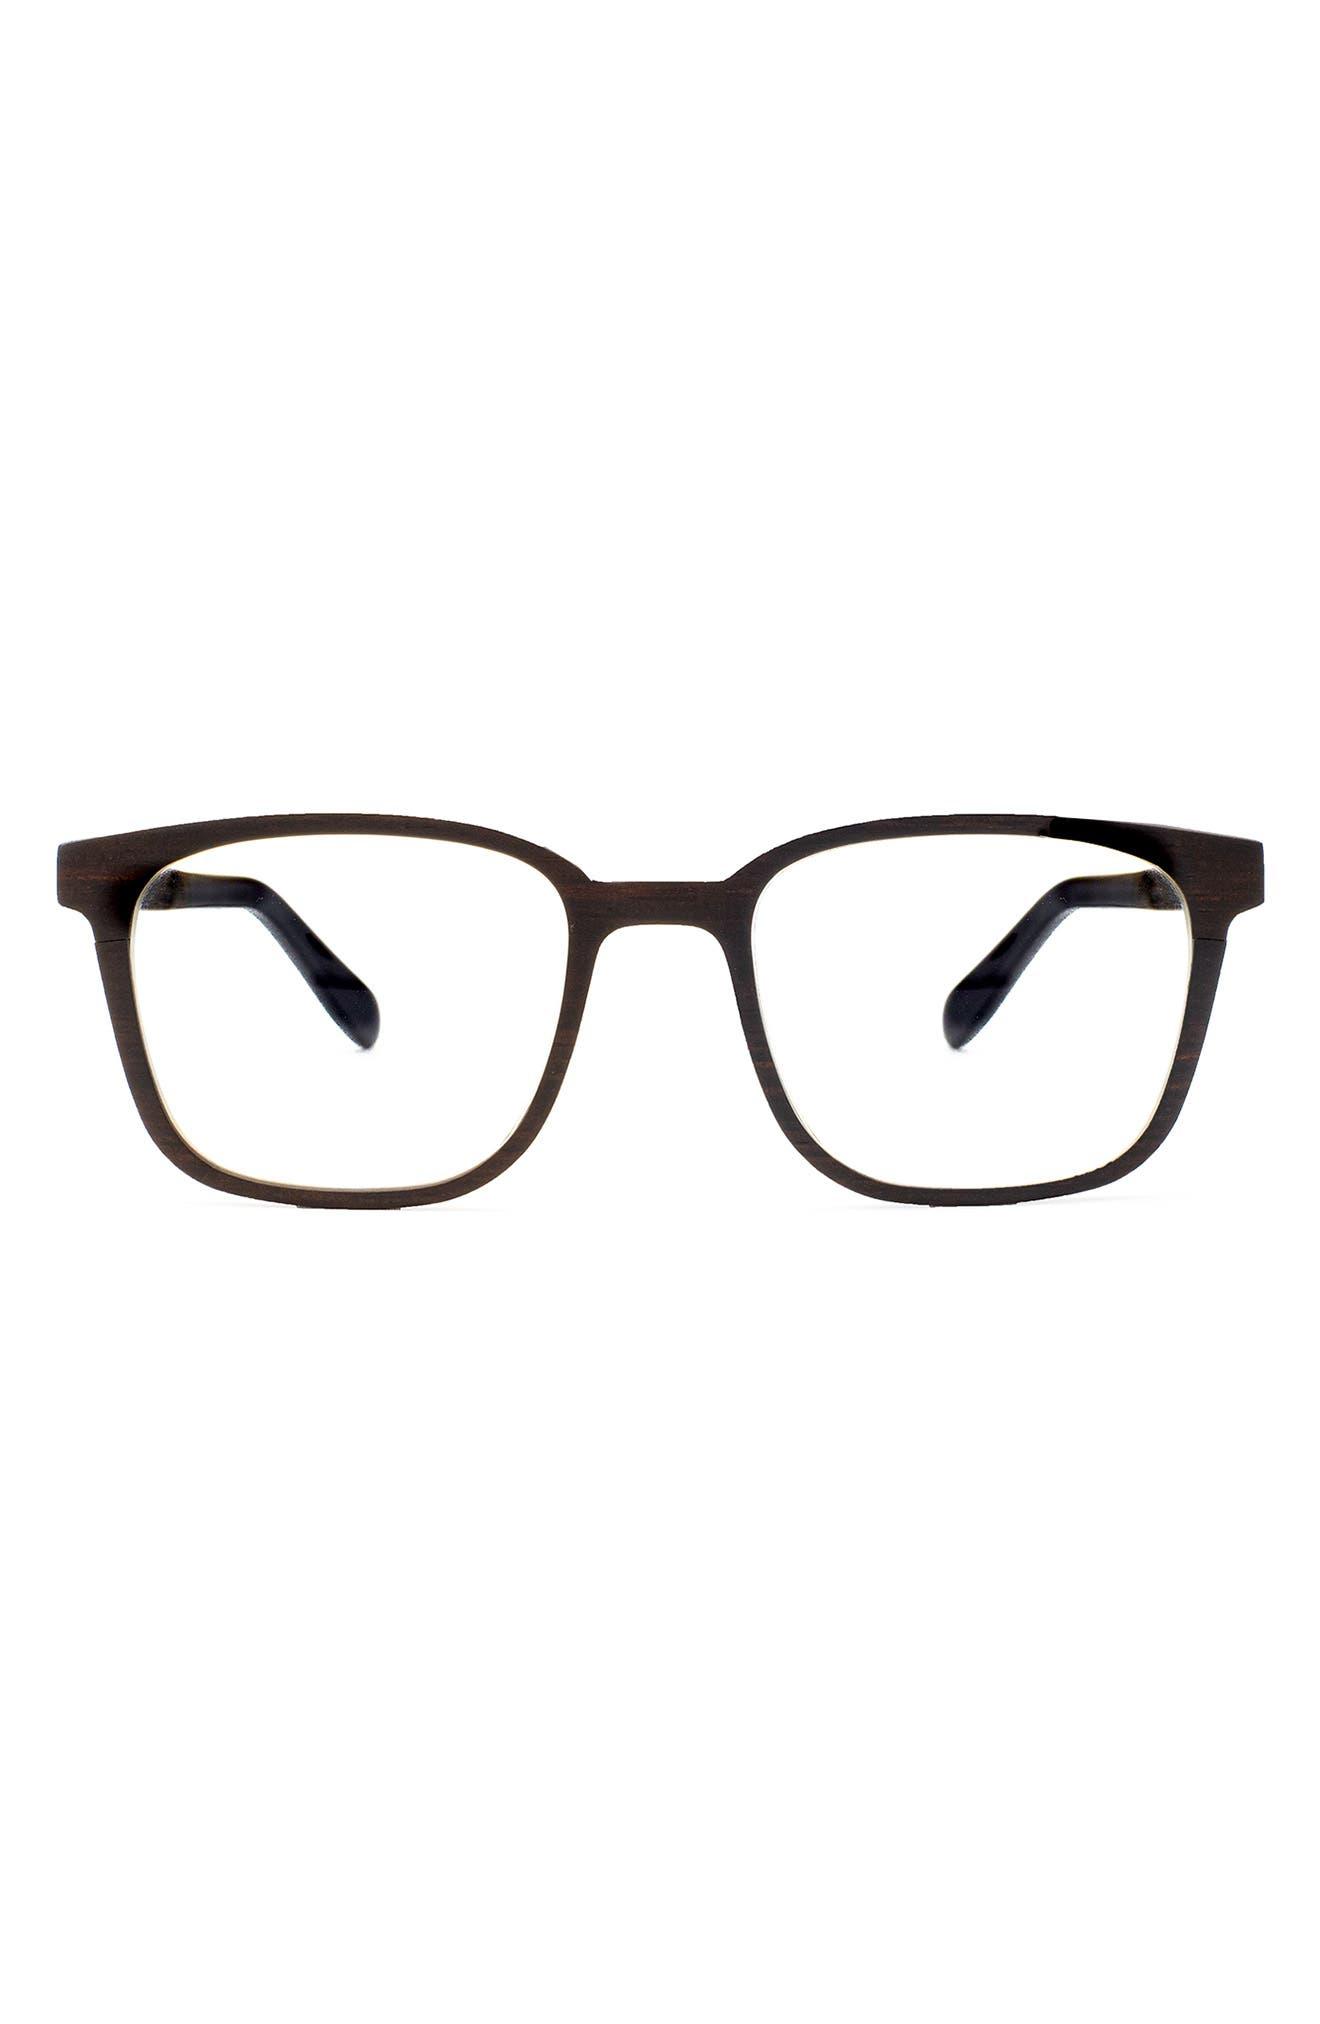 Jetter 50mm Square Optical Glasses